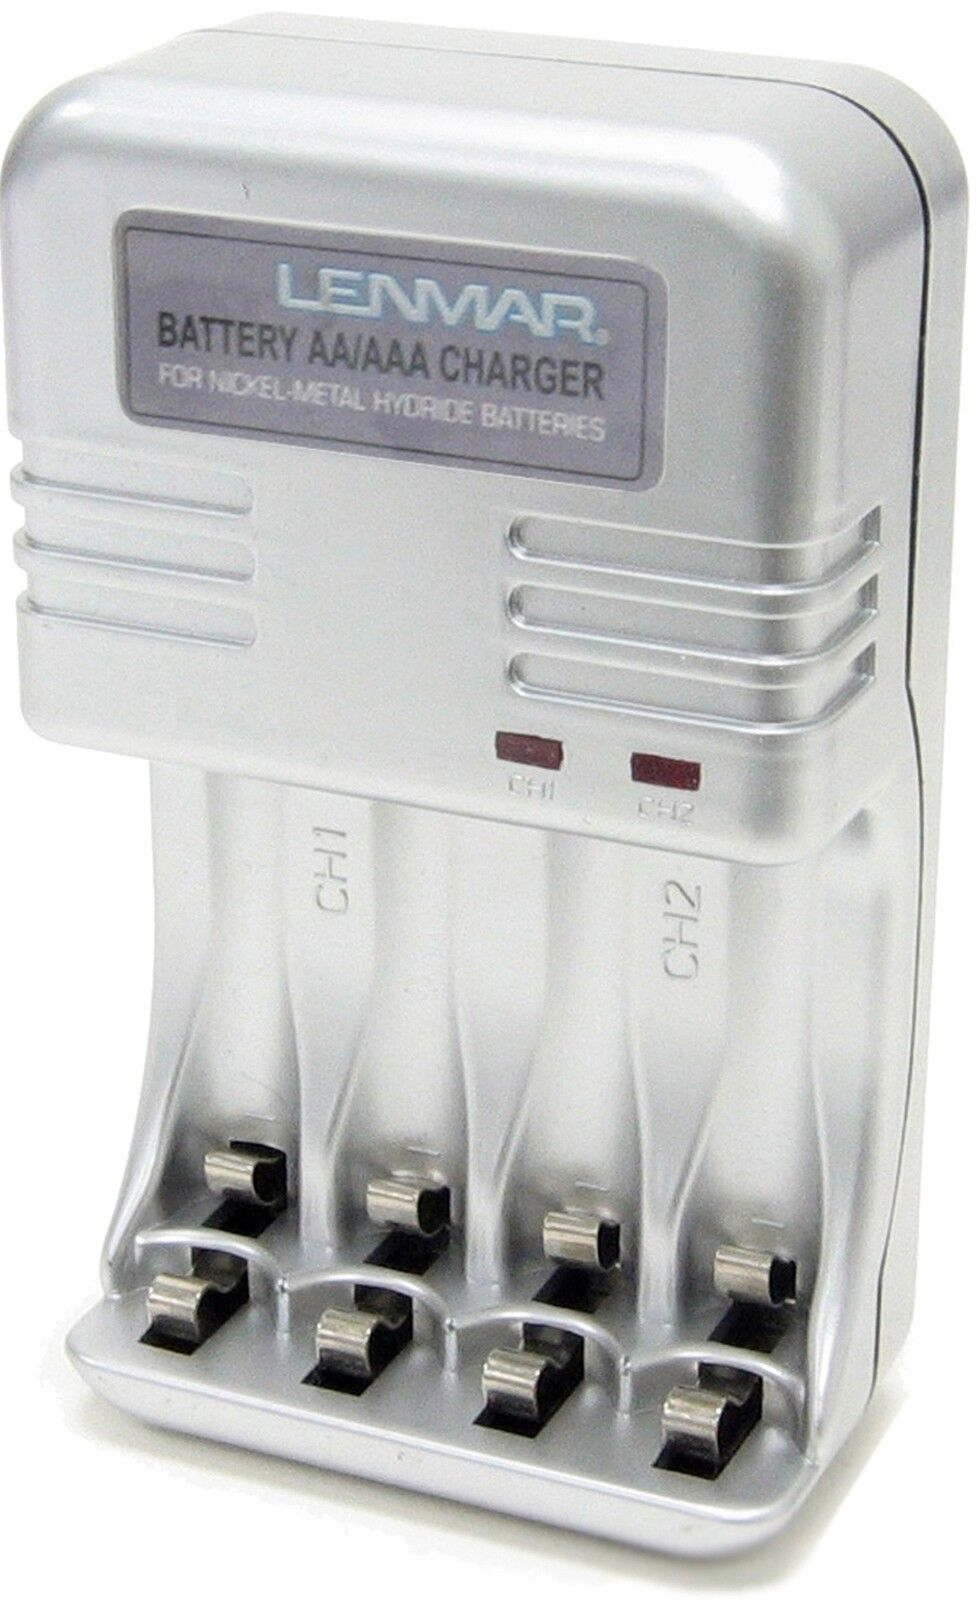 Lenmar Internationally Capable AA & AAA NiMH Battery Charger PRO290 PRO290B